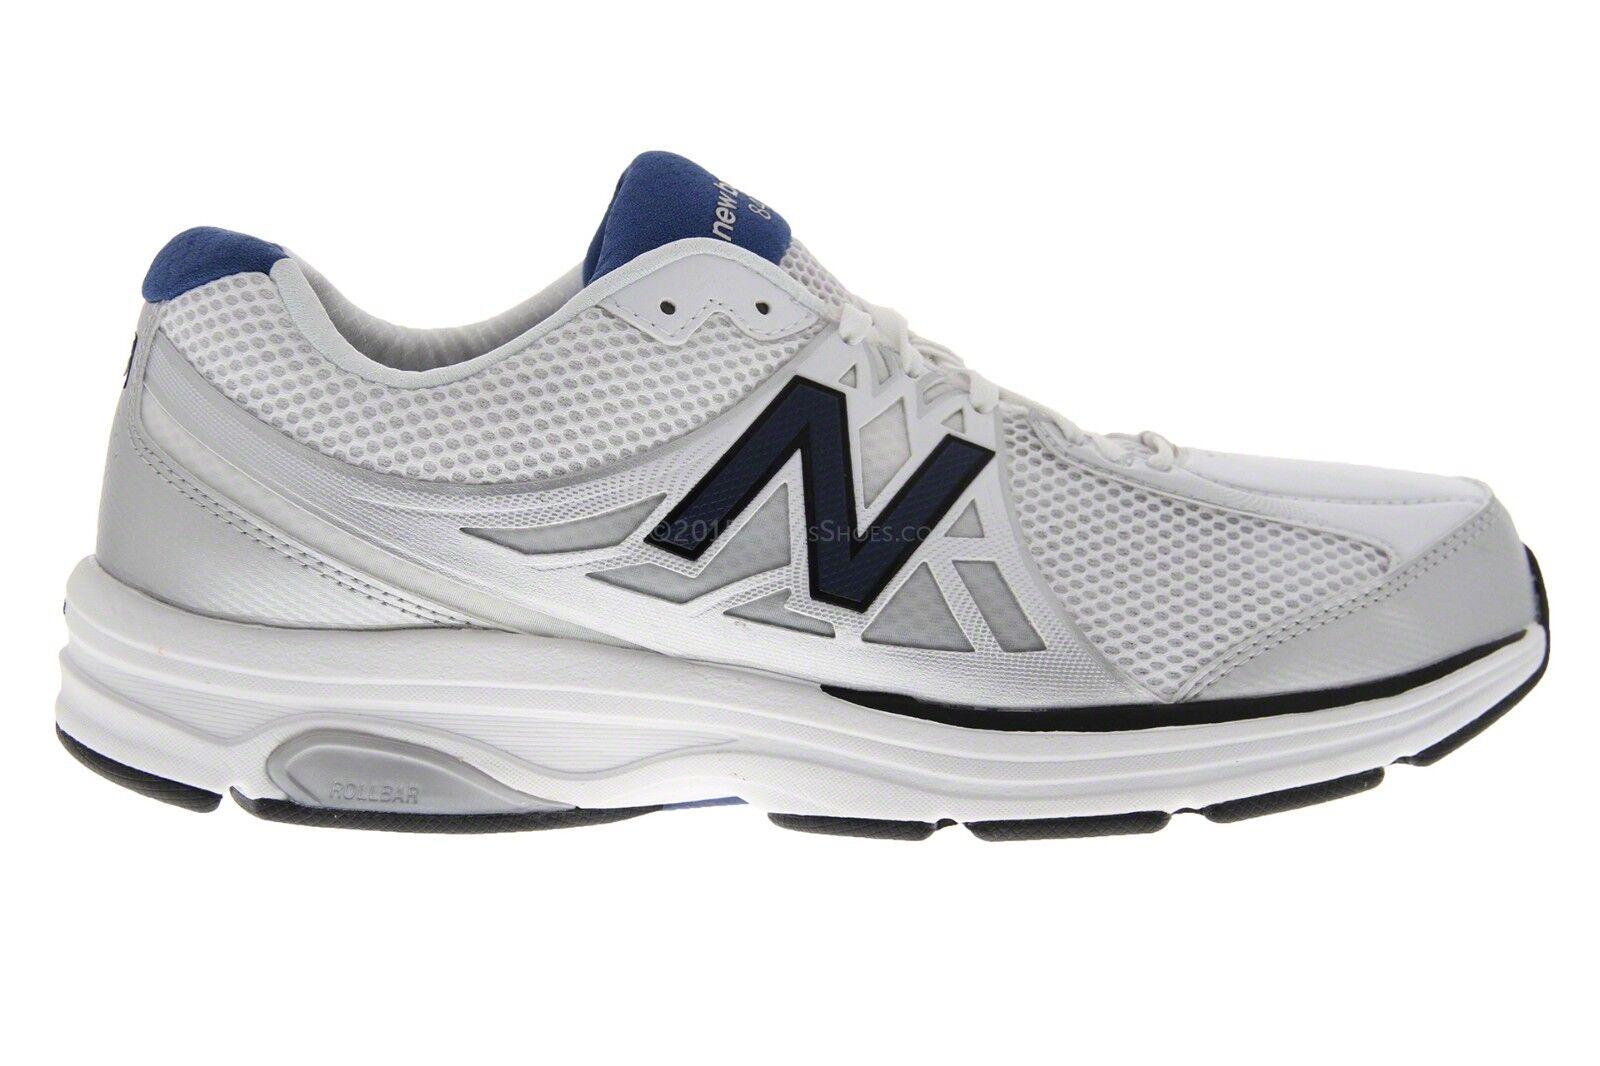 NEW New Balance Men MW847WT2 847 Walking Shoe White Size 12.5 - 2E